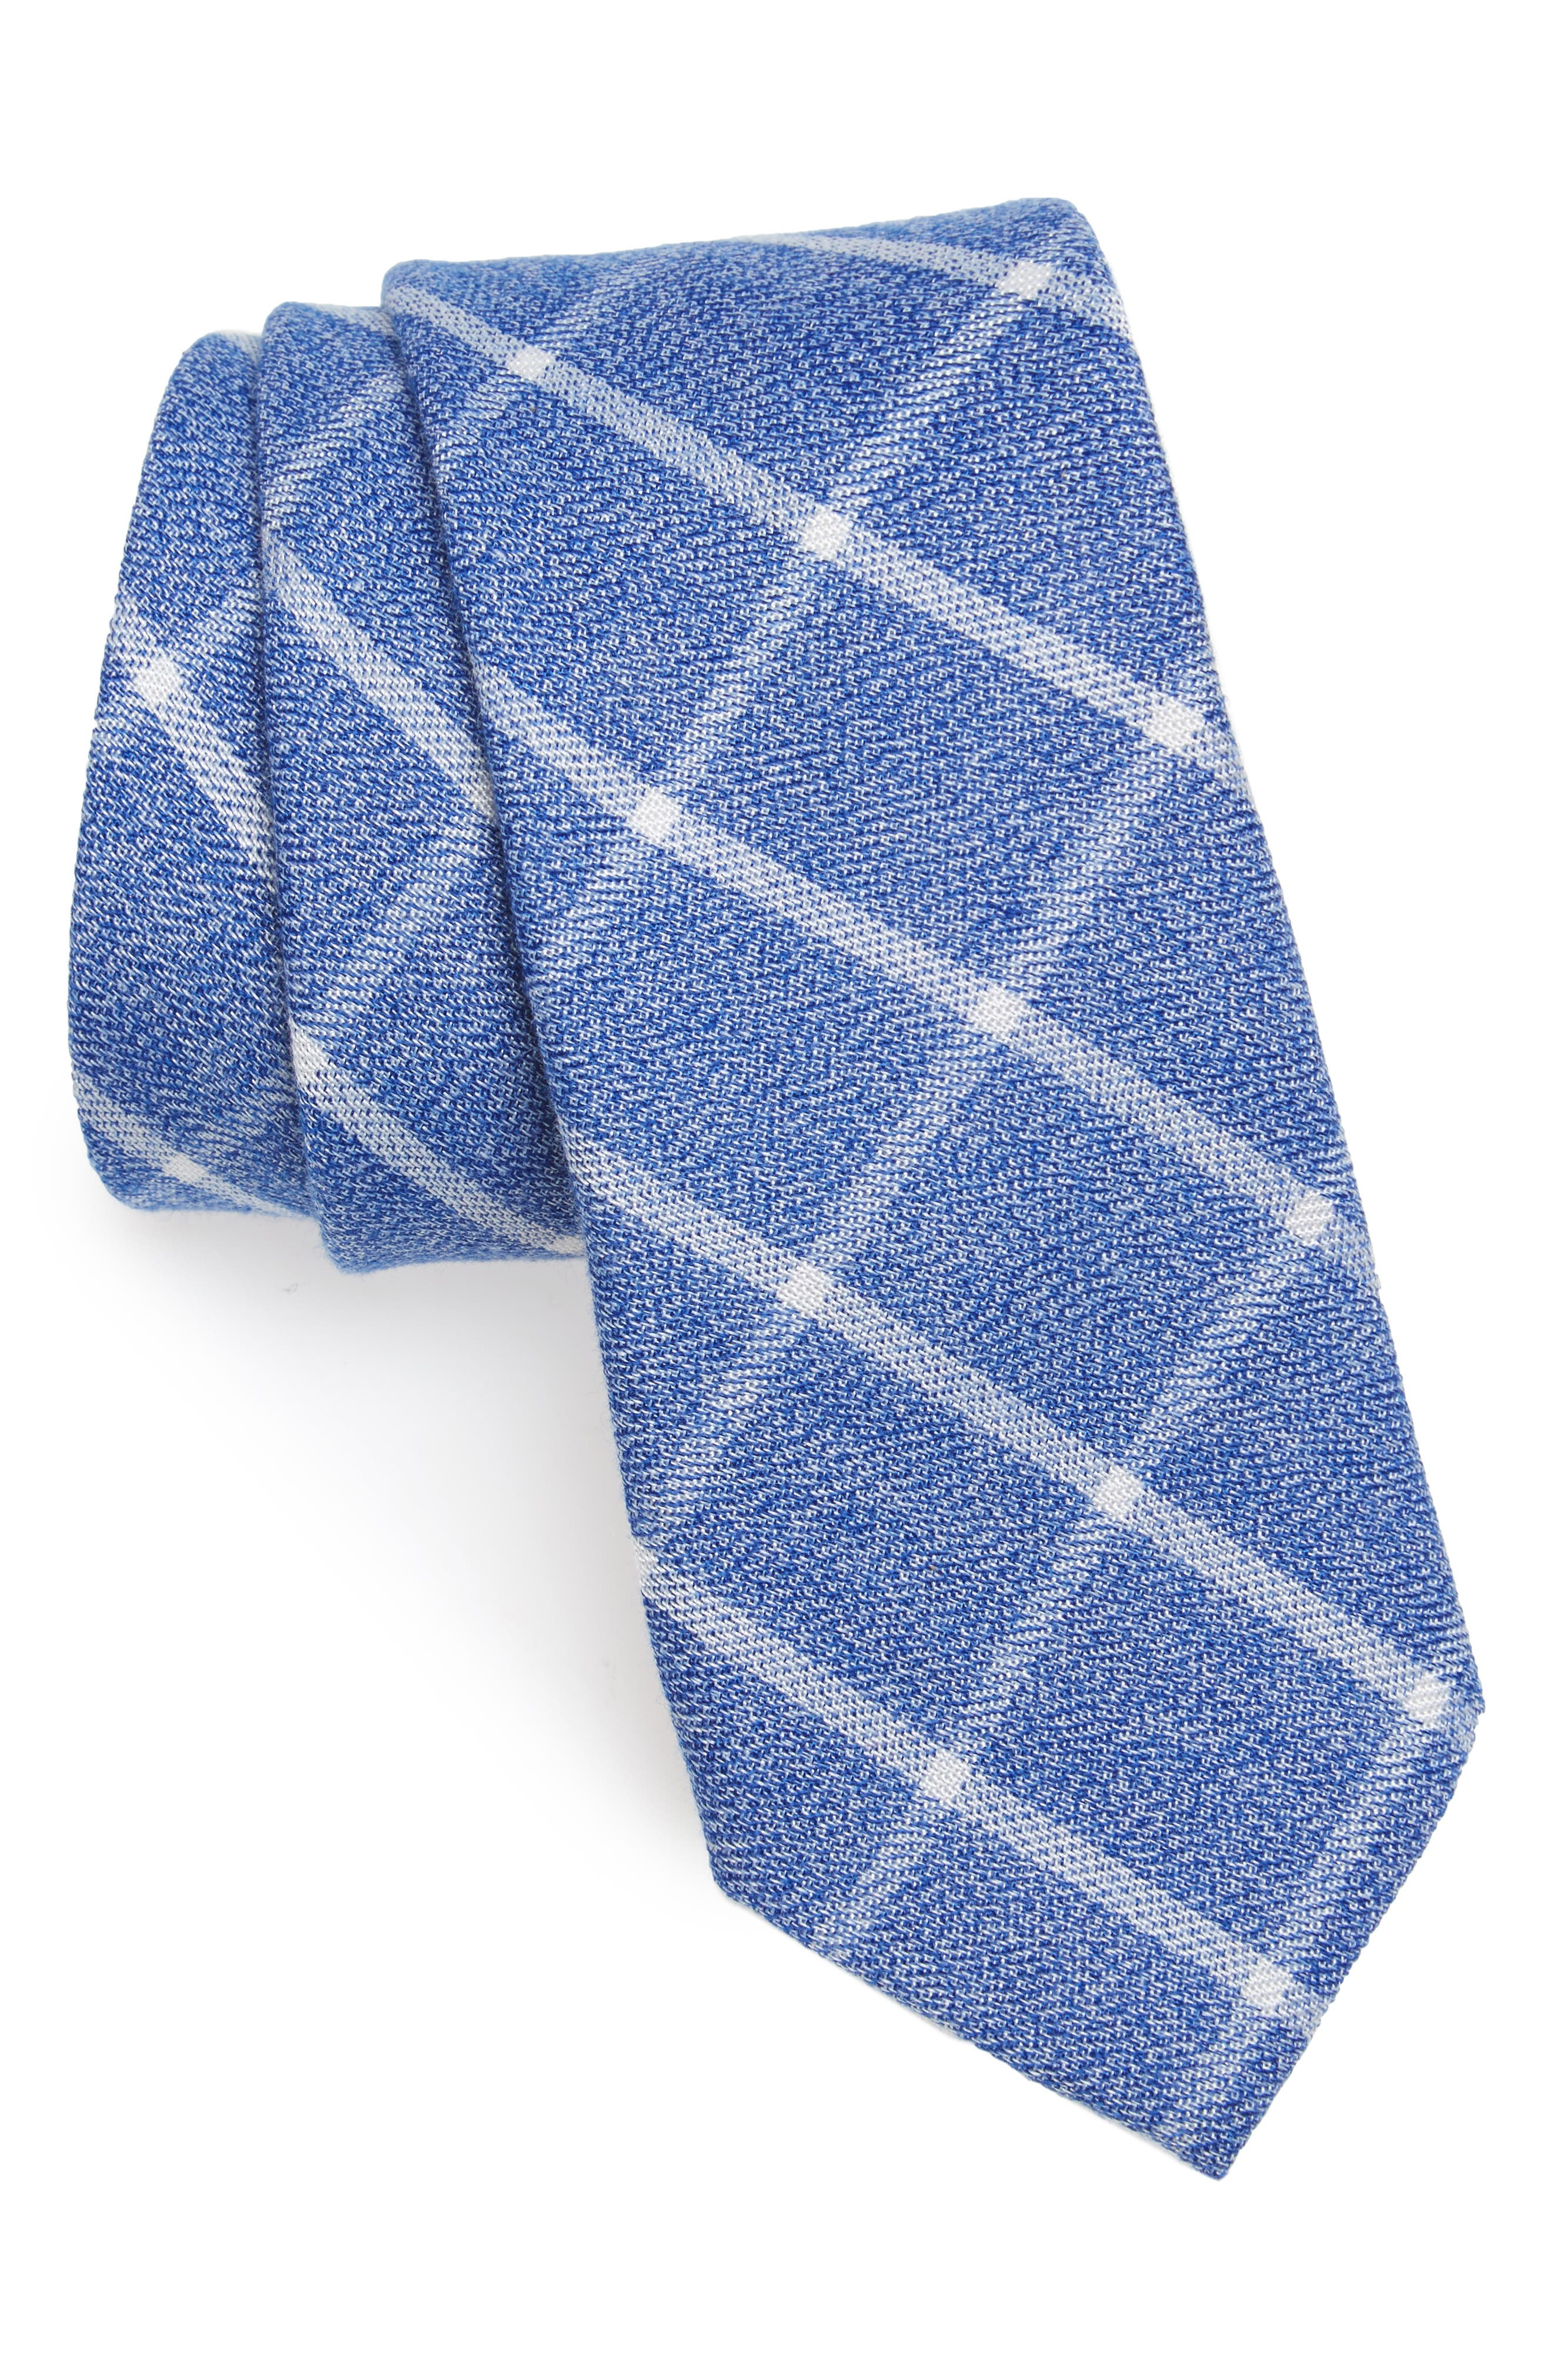 Alternate Image 1 Selected - Nordstrom Men's Shop Wilbur Check Cotton Tie